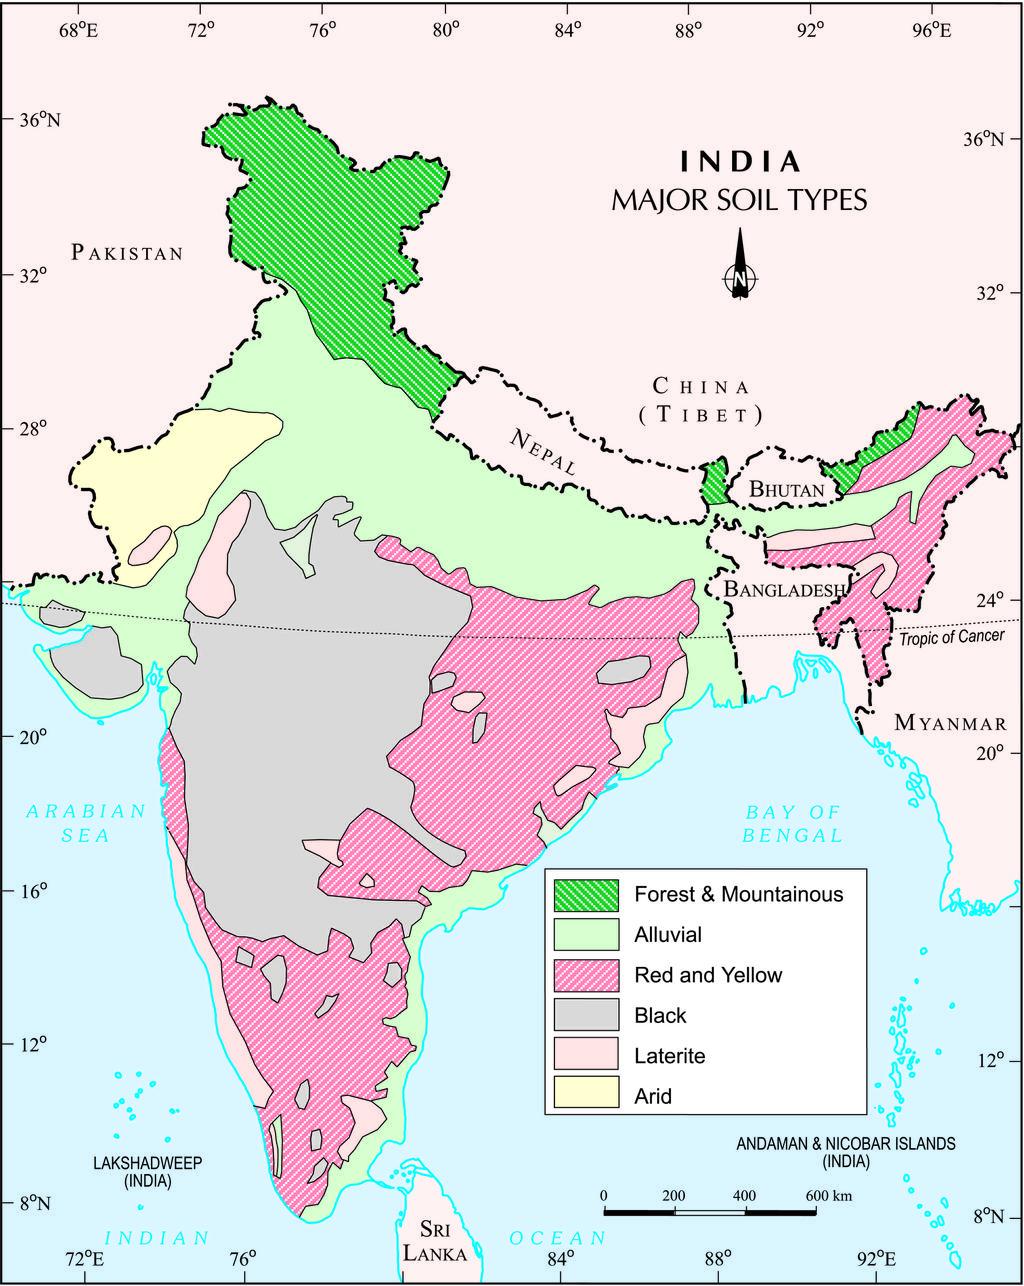 The Zonal Soil Type Of Peninsular India Belongs To